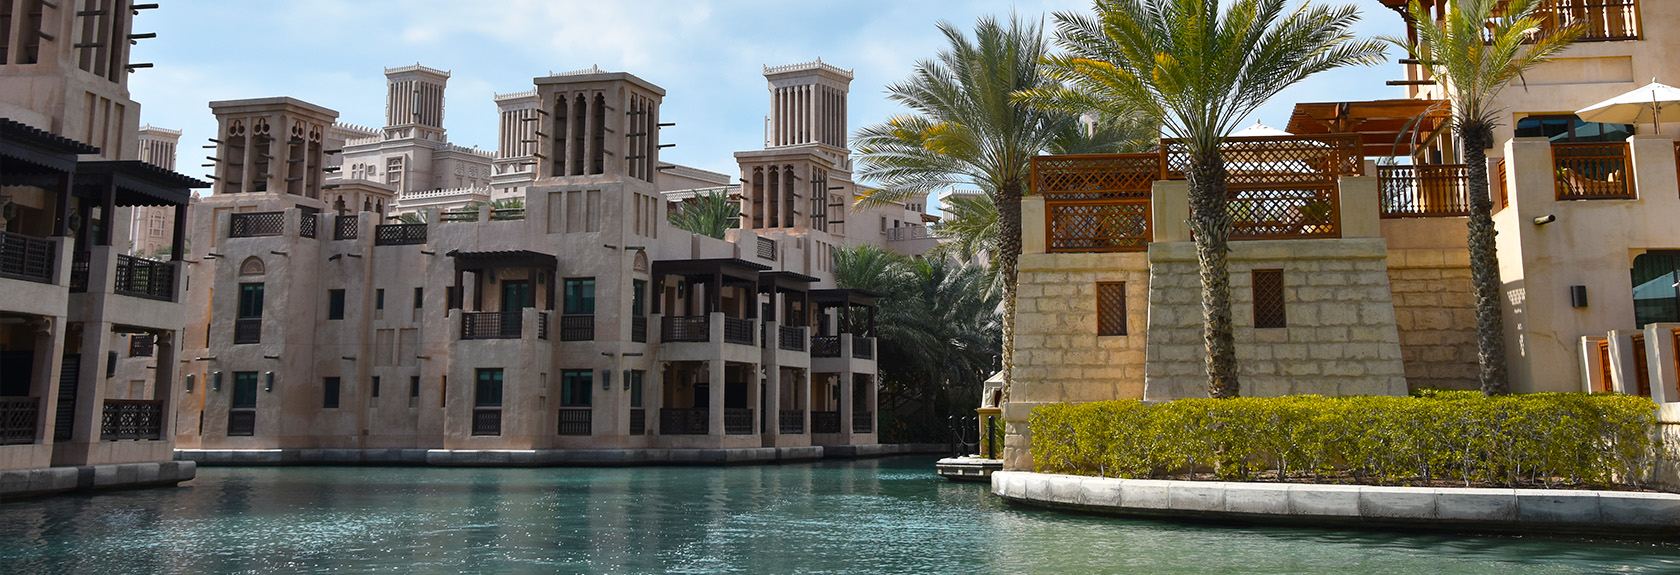 Hotels in Madinat Jumeirah